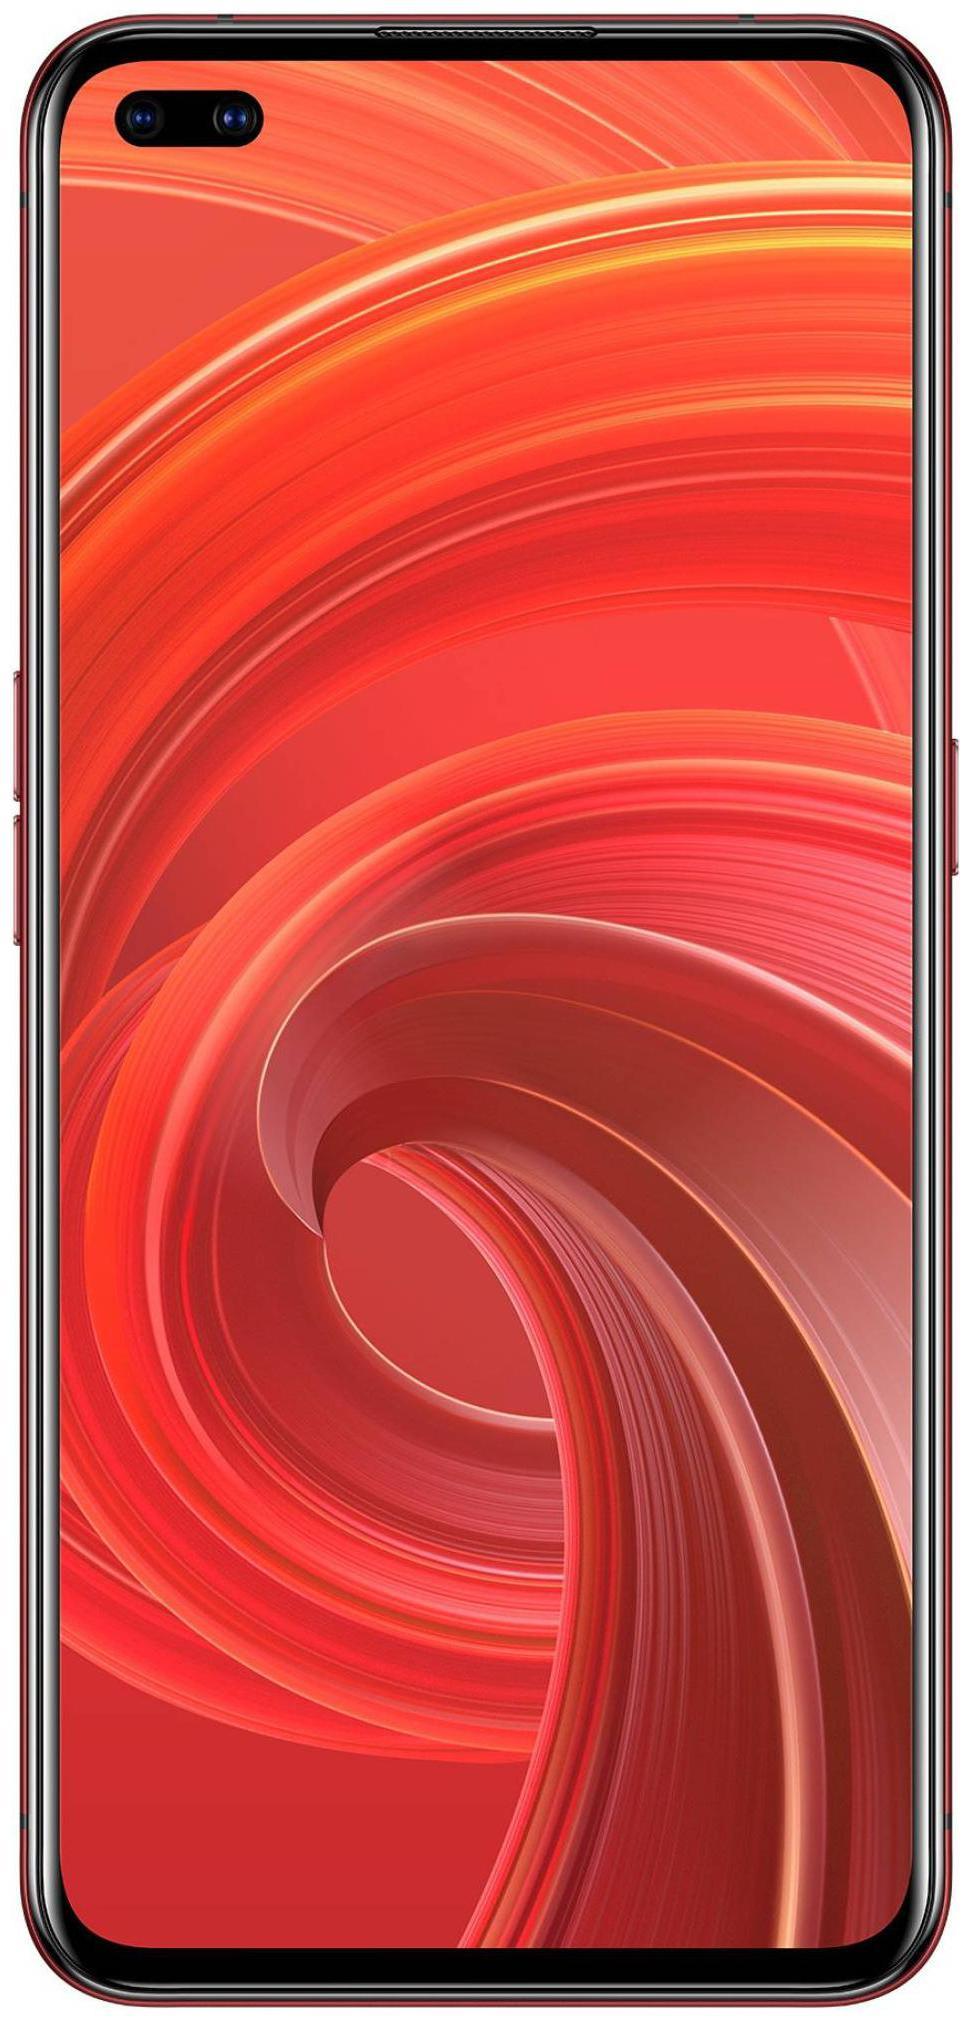 Realme X50 Pro 12 GB 256 GB Rust Red